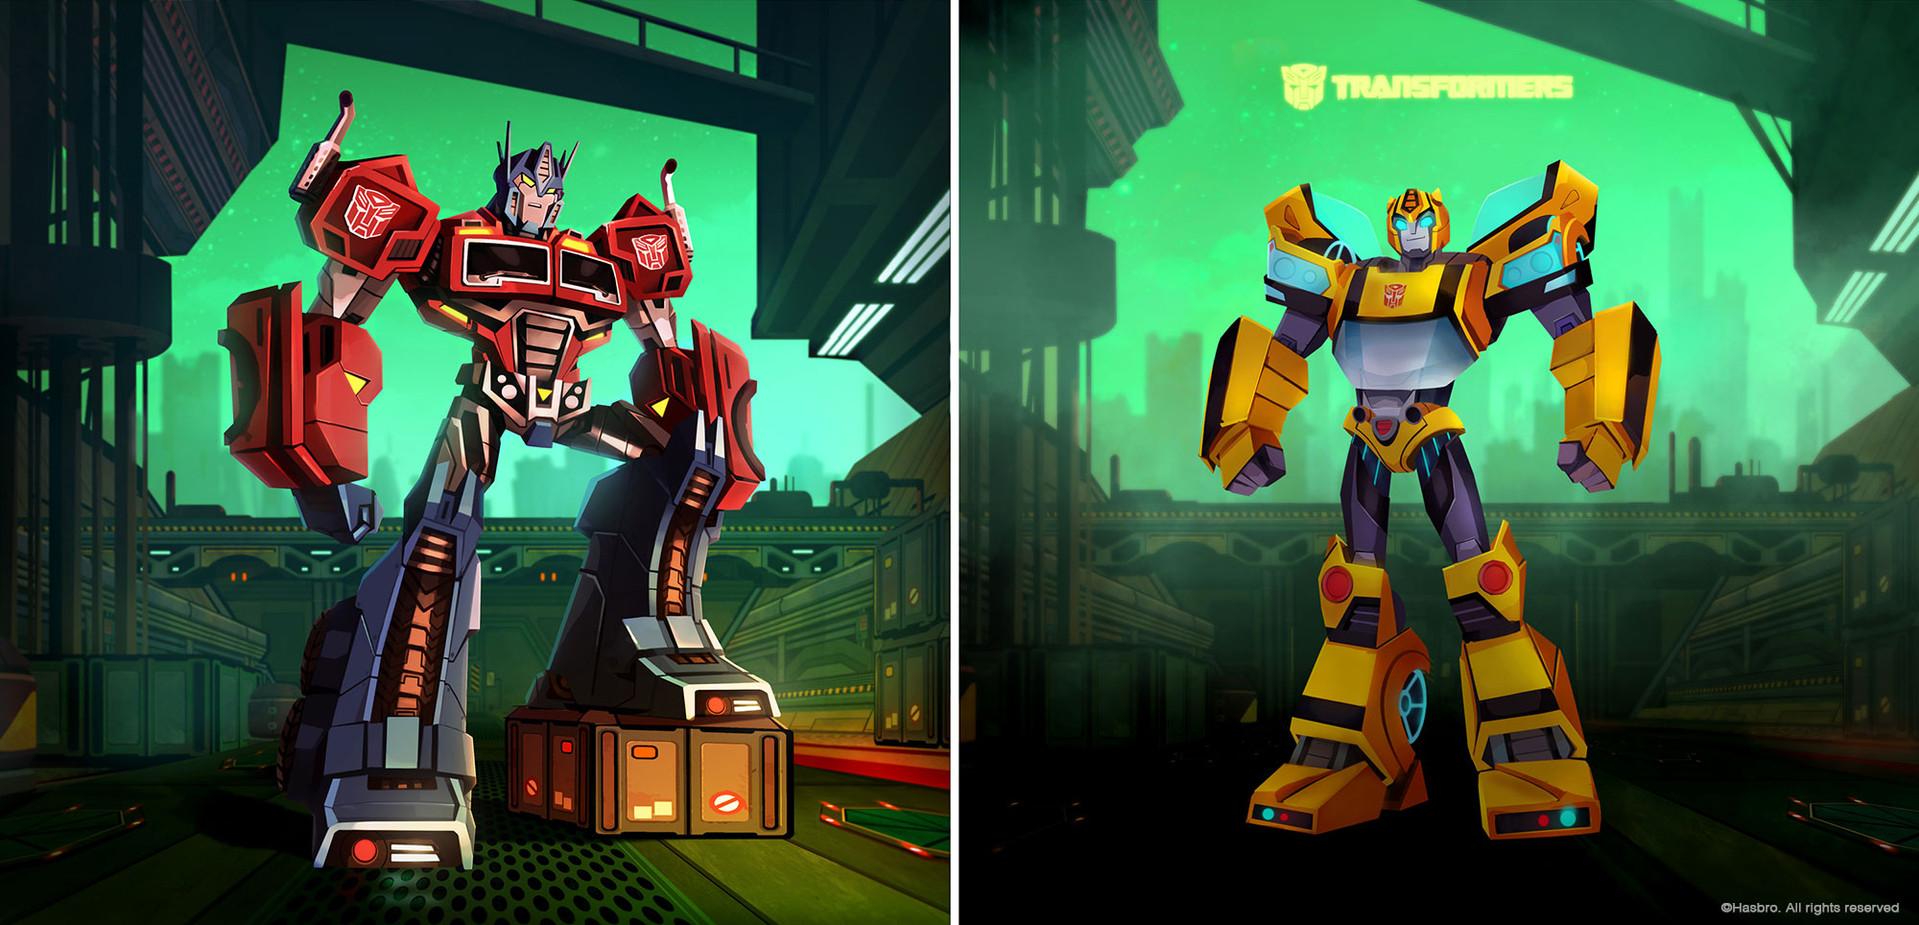 Transformer Cyberverse - Final look proposal